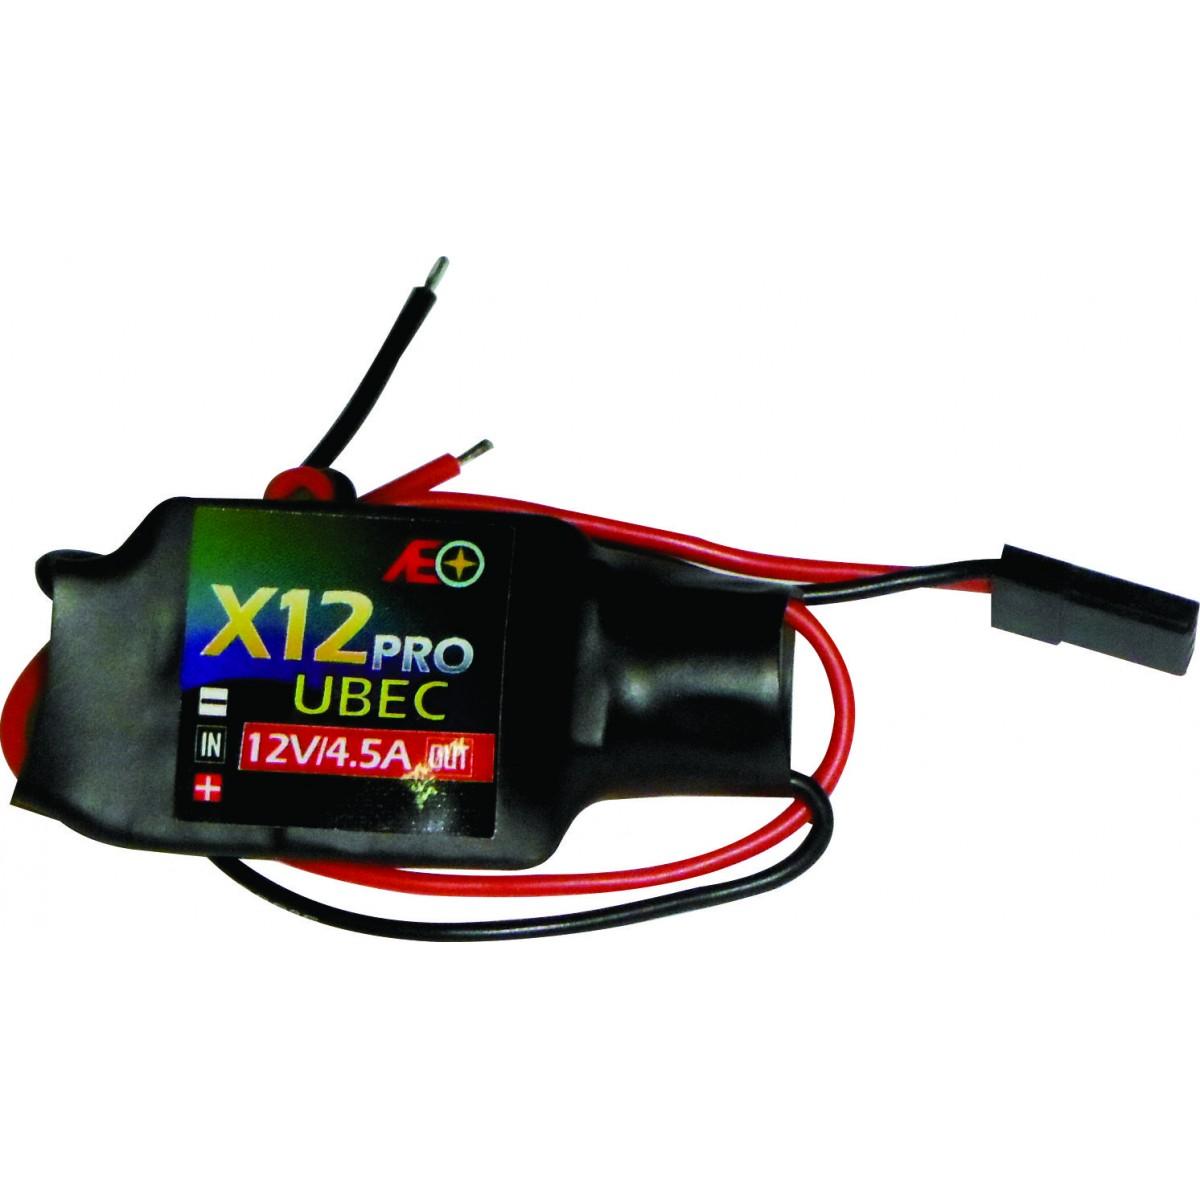 Bec Reg.de Voltagem Input:7.2 A 21v-output-12v-drone Com Led  - King Models